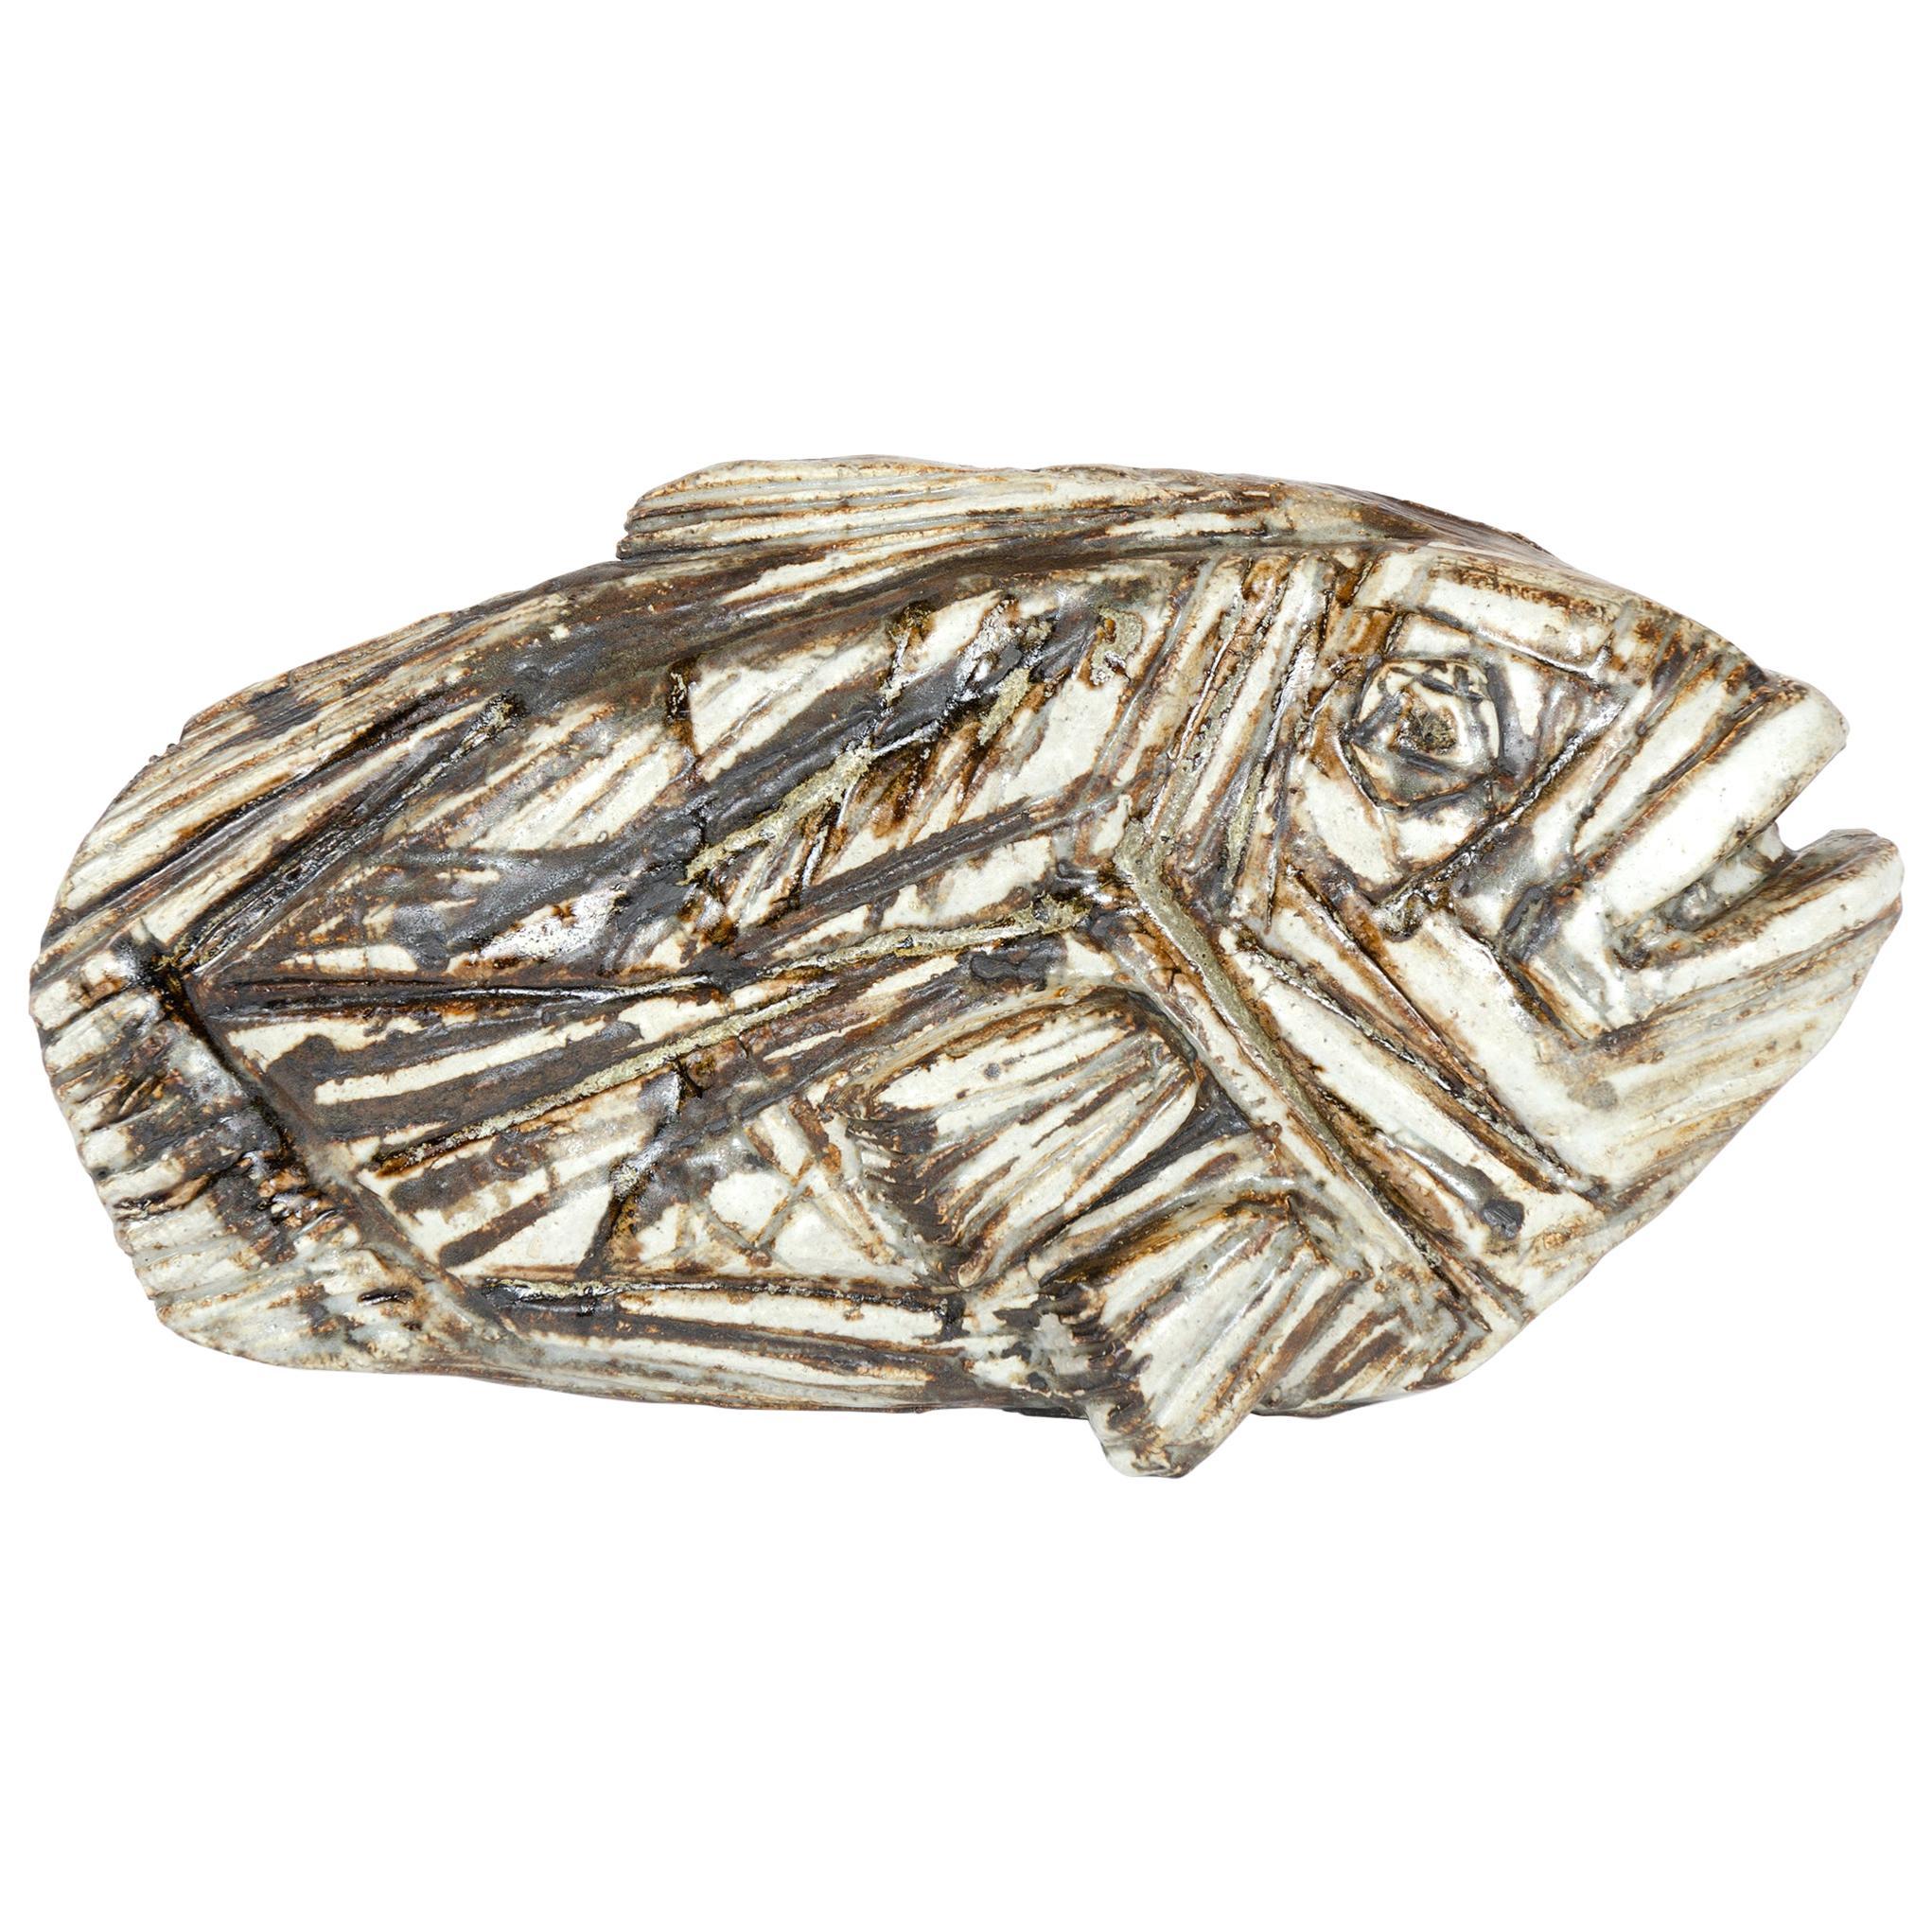 1960s Finnish Fossilized Fish Sculpture by Taisto Kaasinen for Arabia